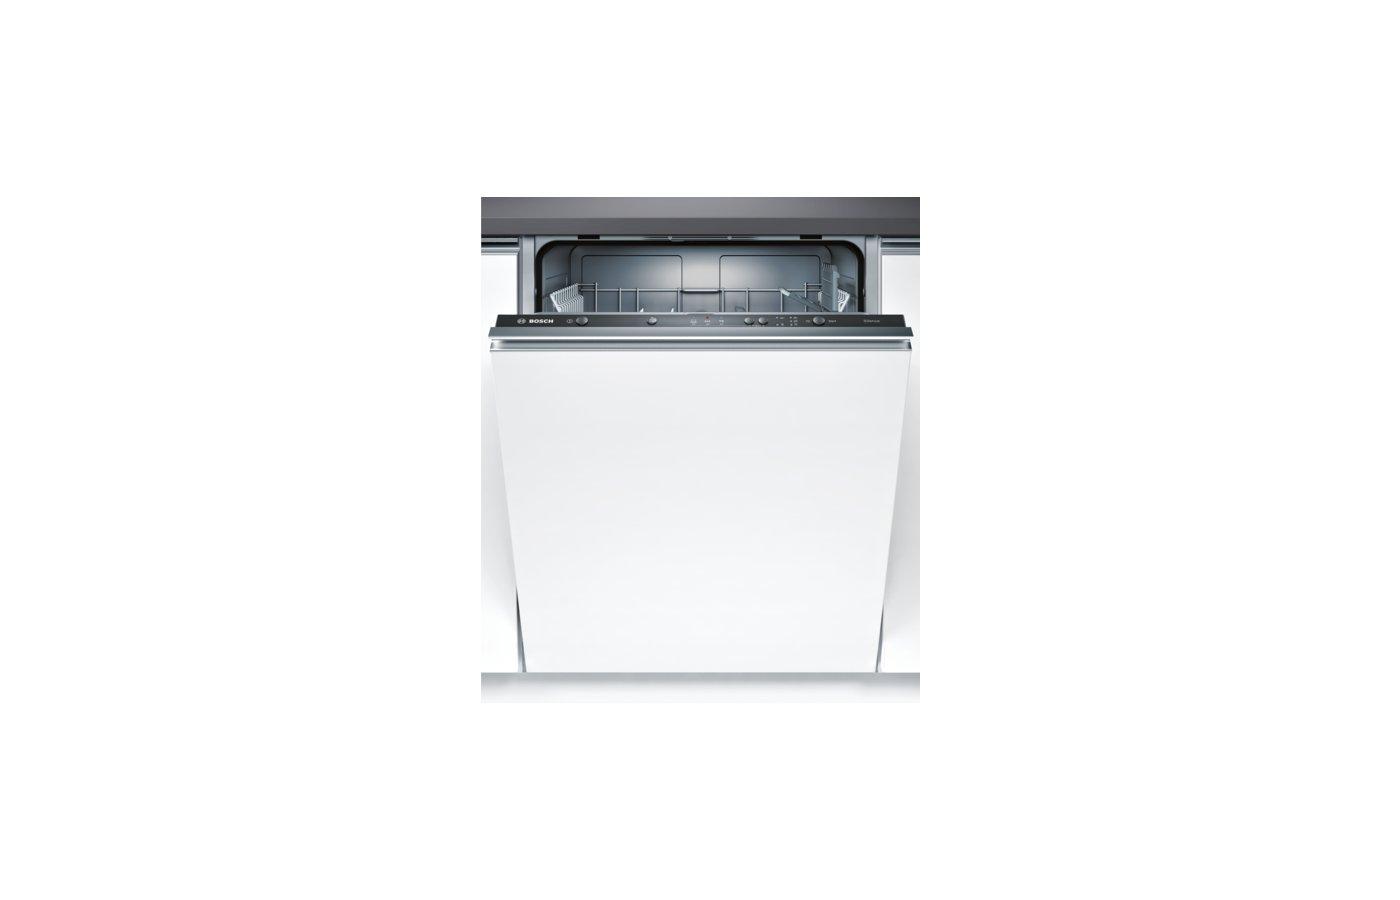 Bosch smv23ax00r посудомоечная машина